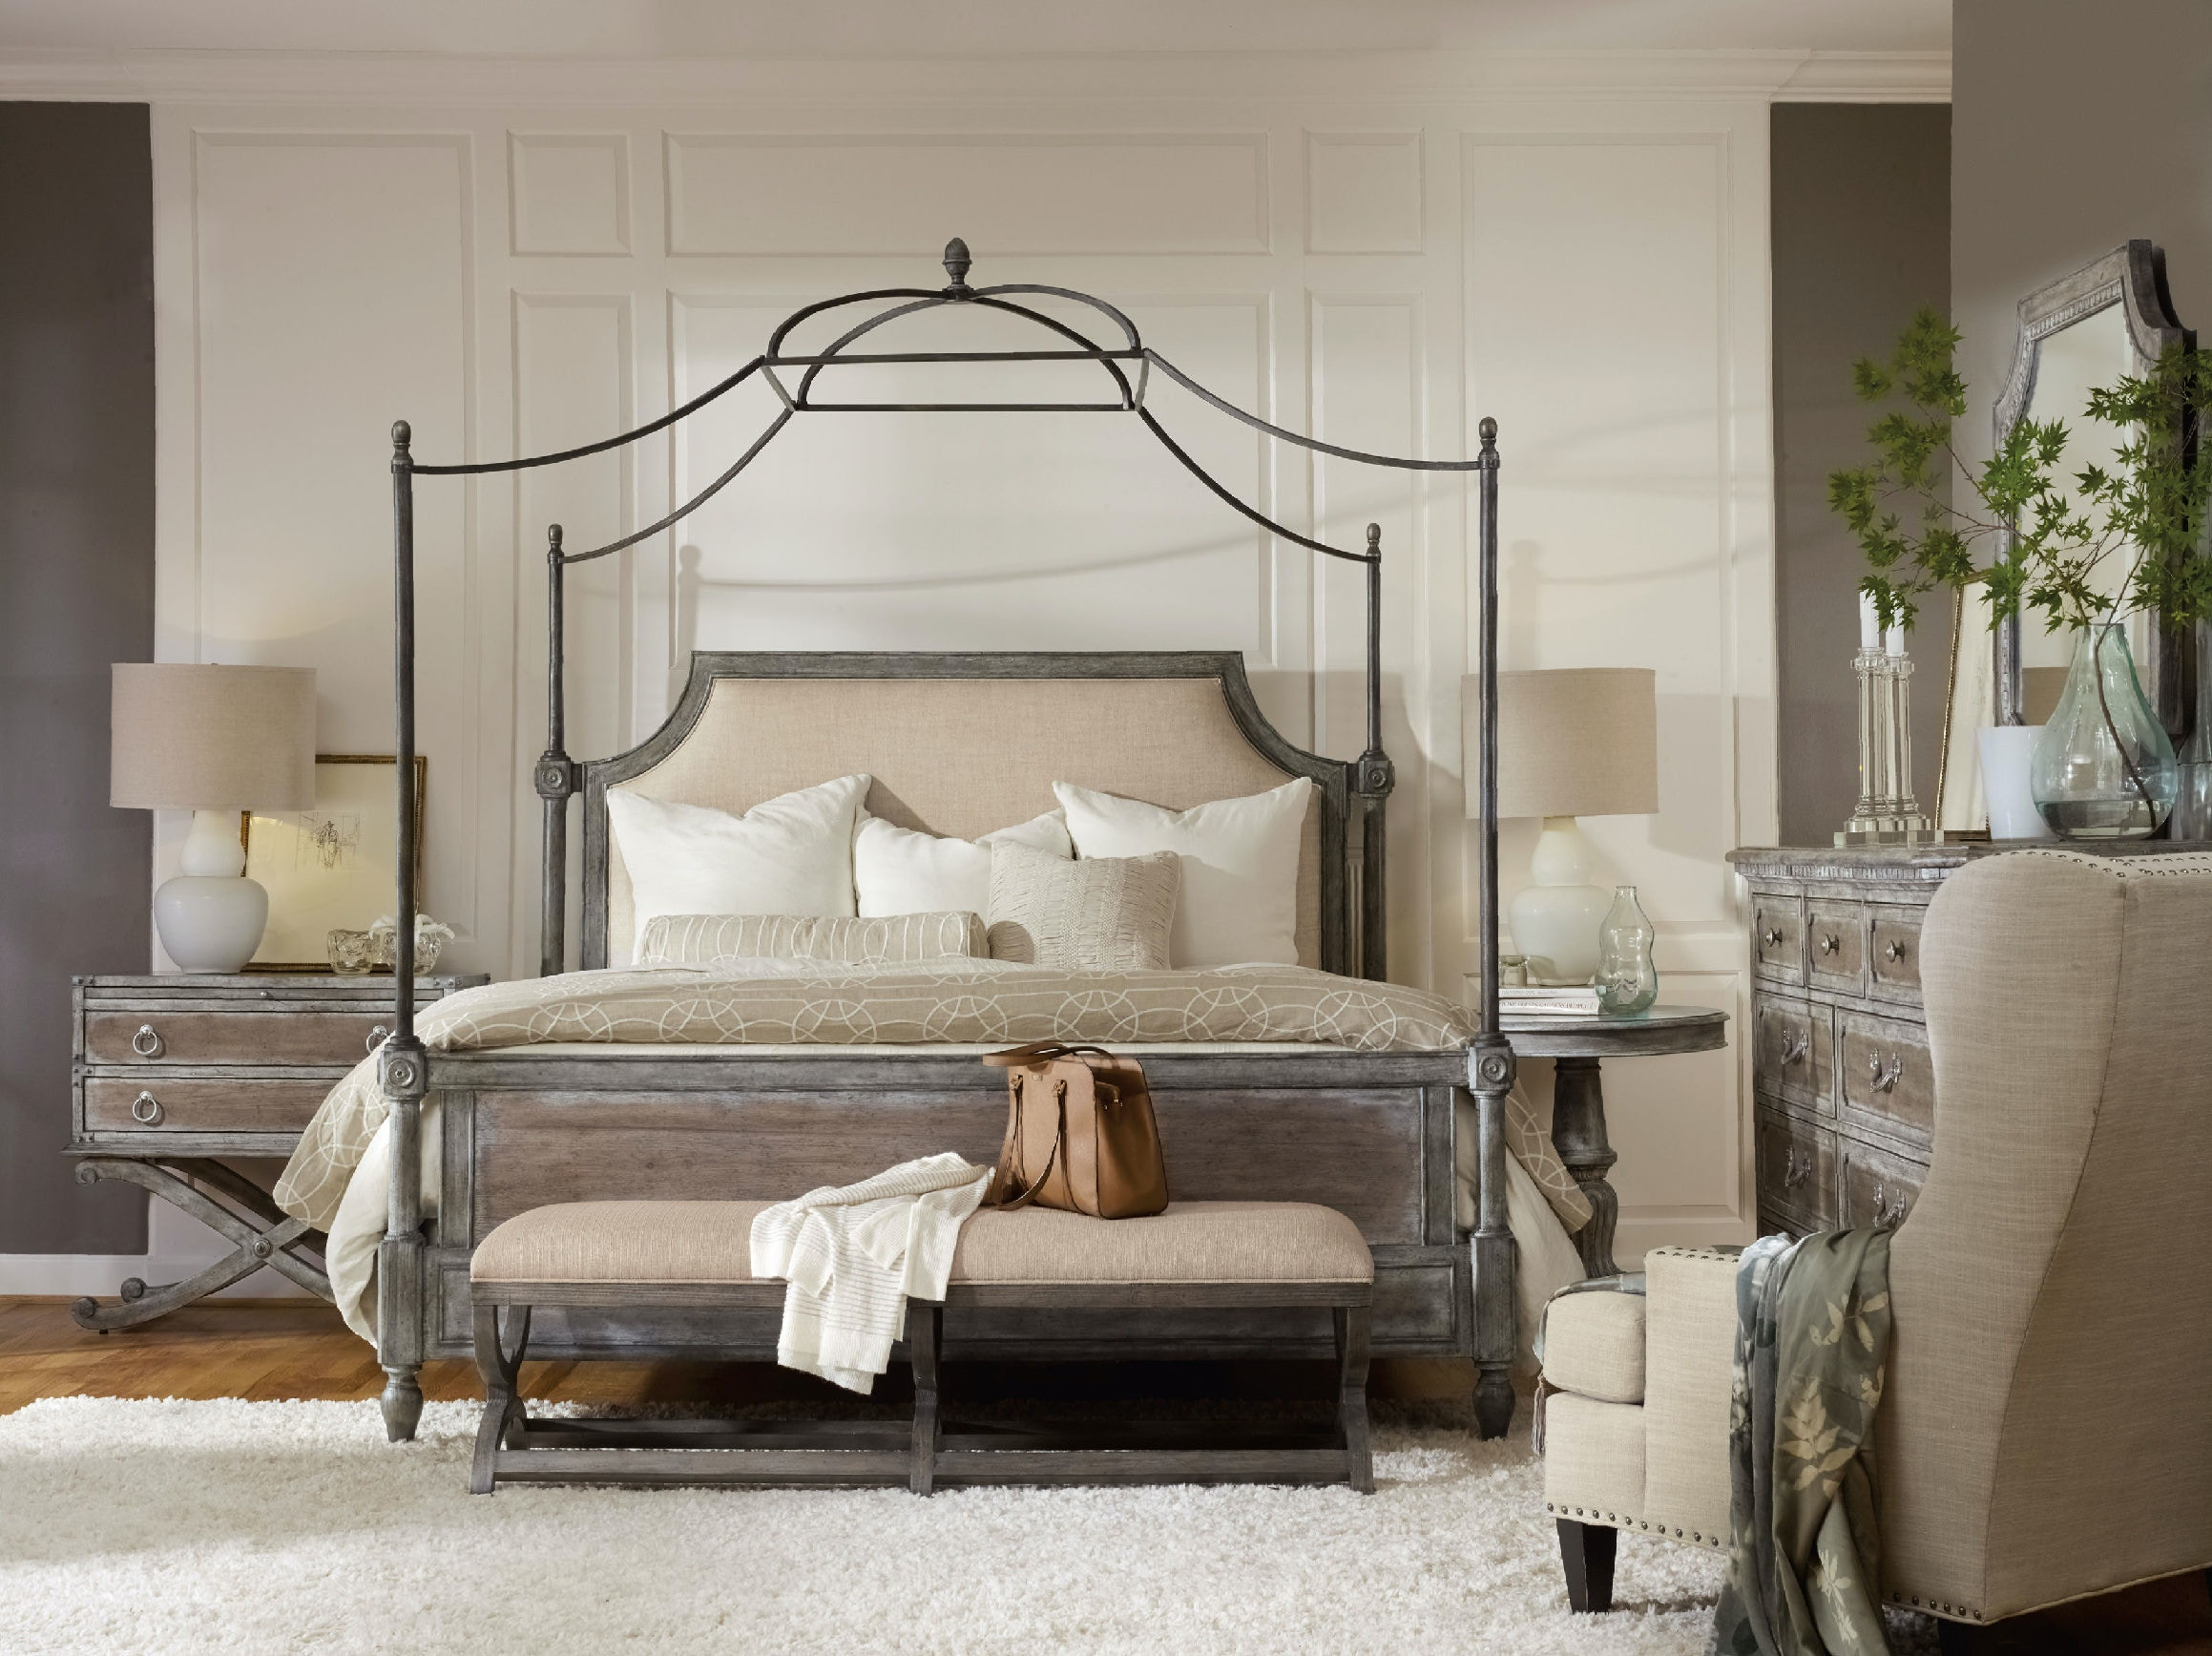 Hooker Furniture True Vintage King Fabric Upholstered Canopy Bed 5701-90166